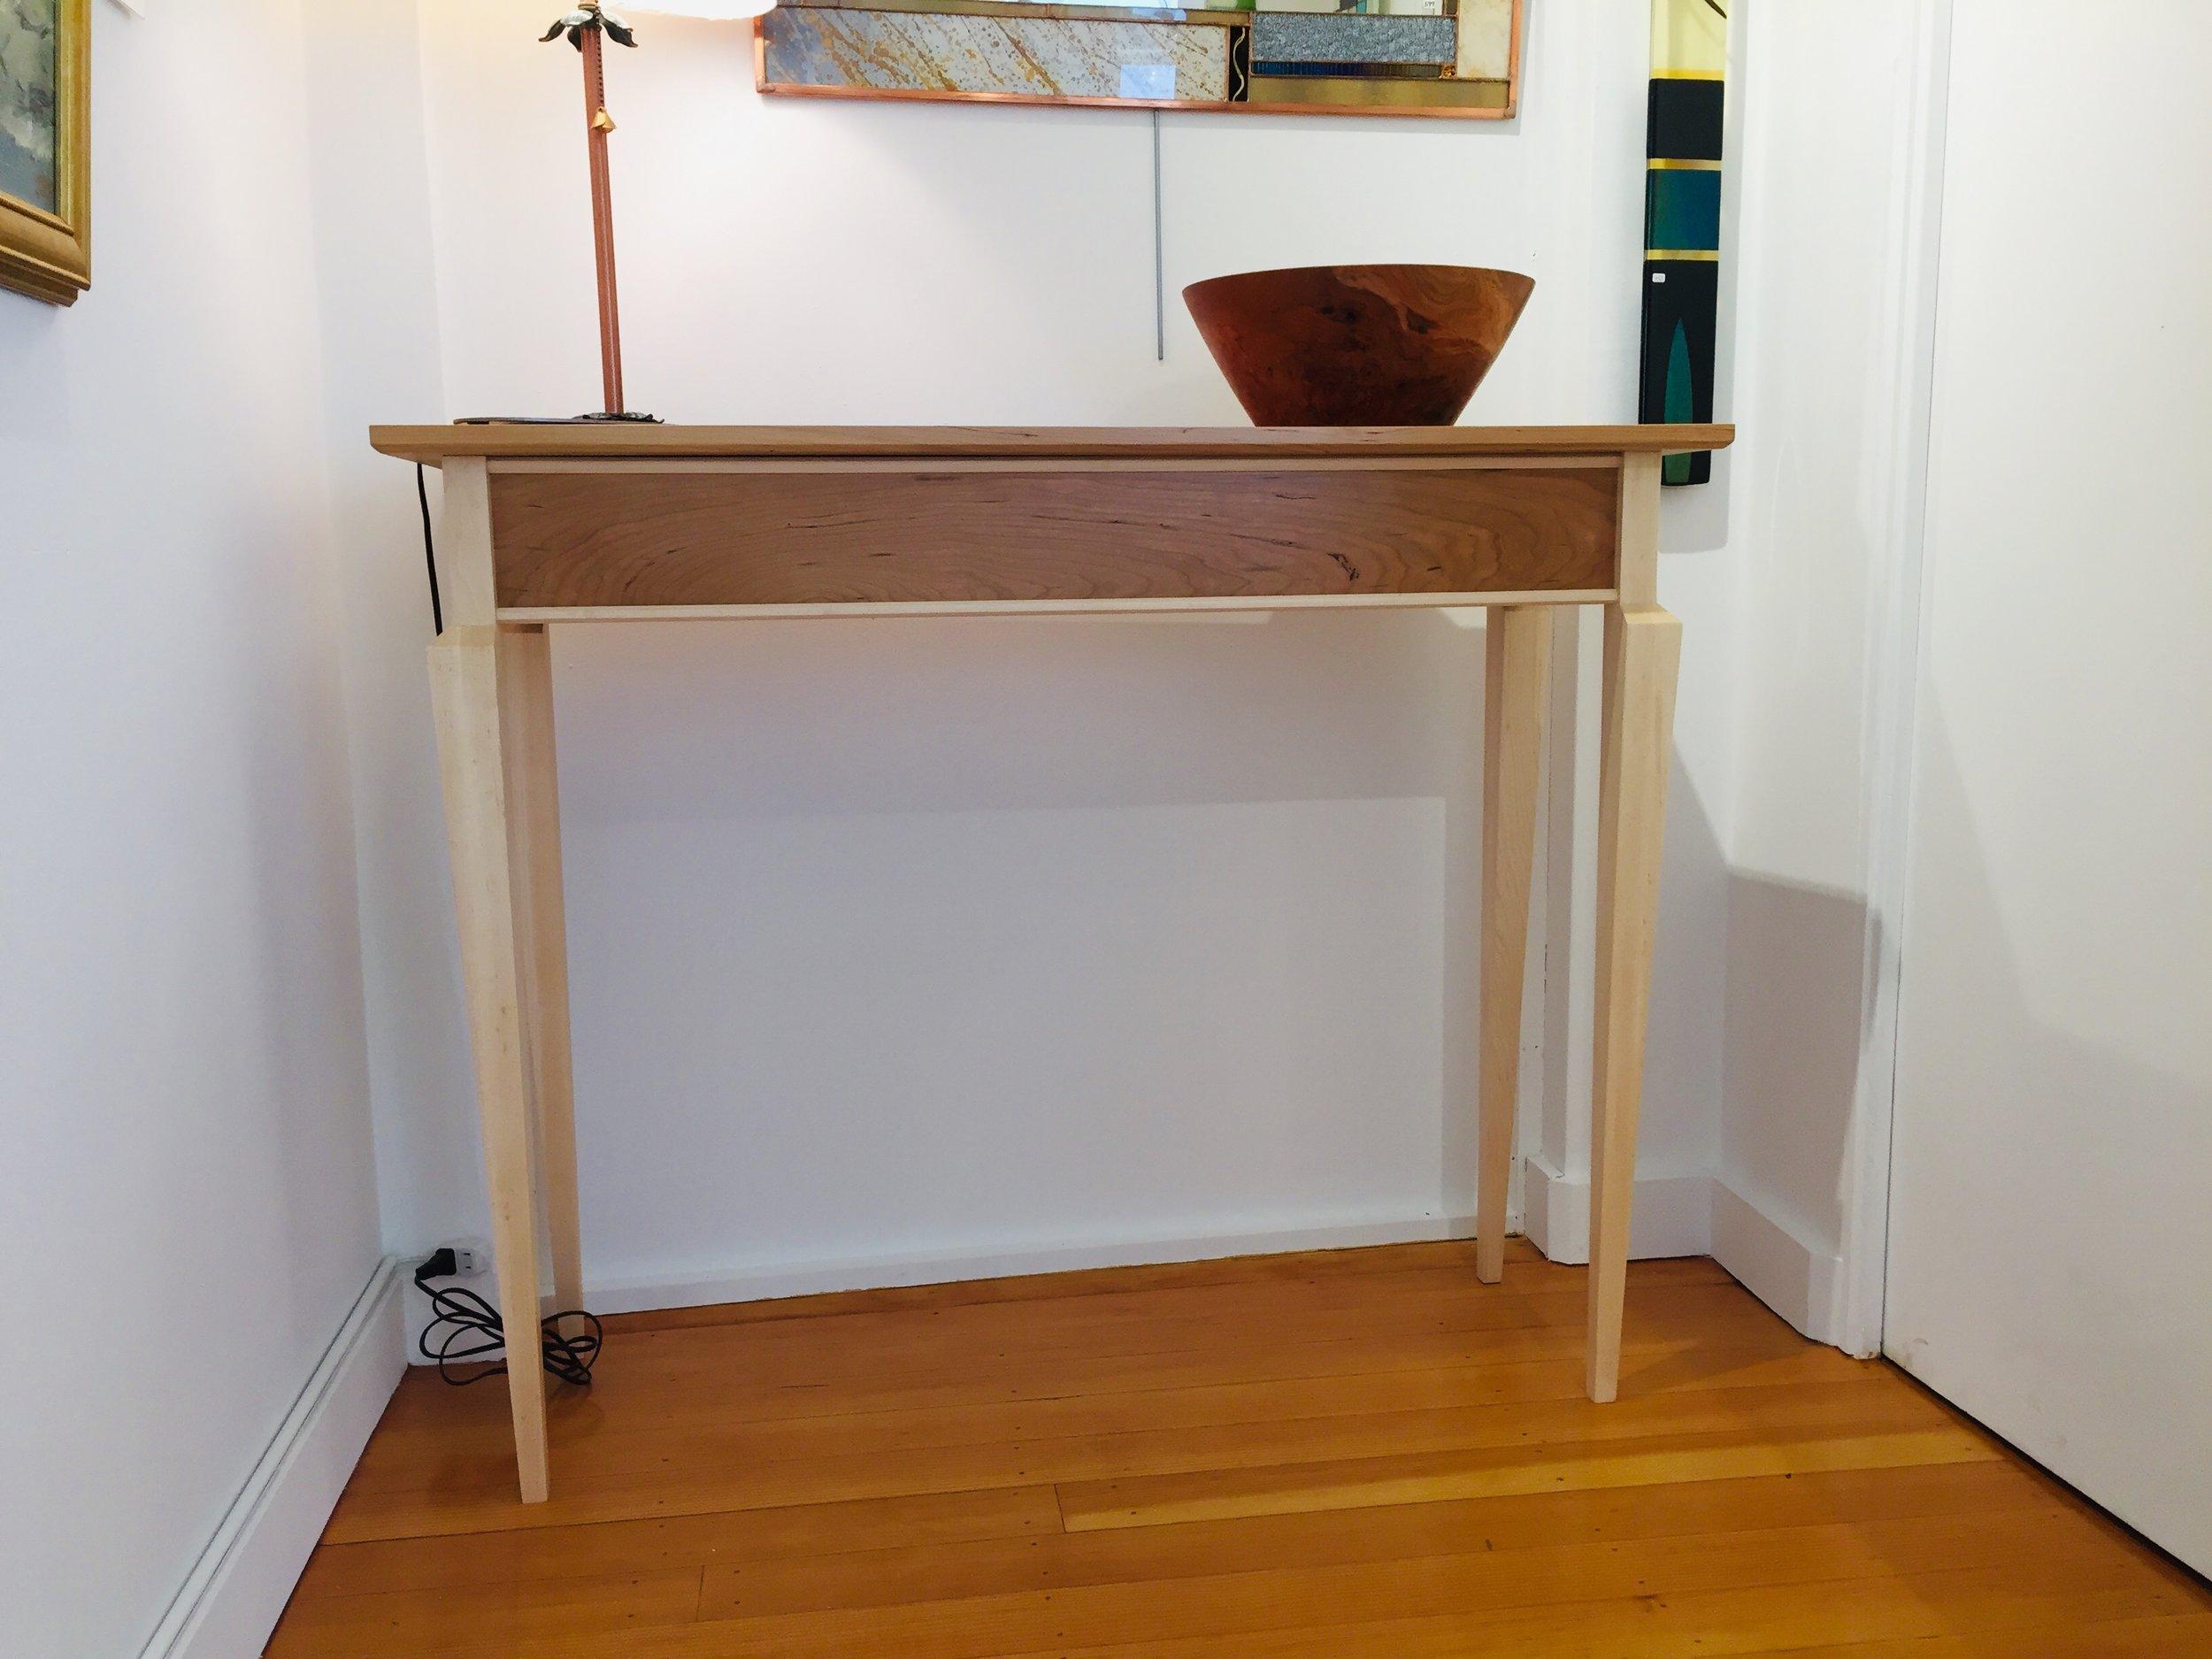 Cape Cod Furniture at Rachel K DeLong Gallery